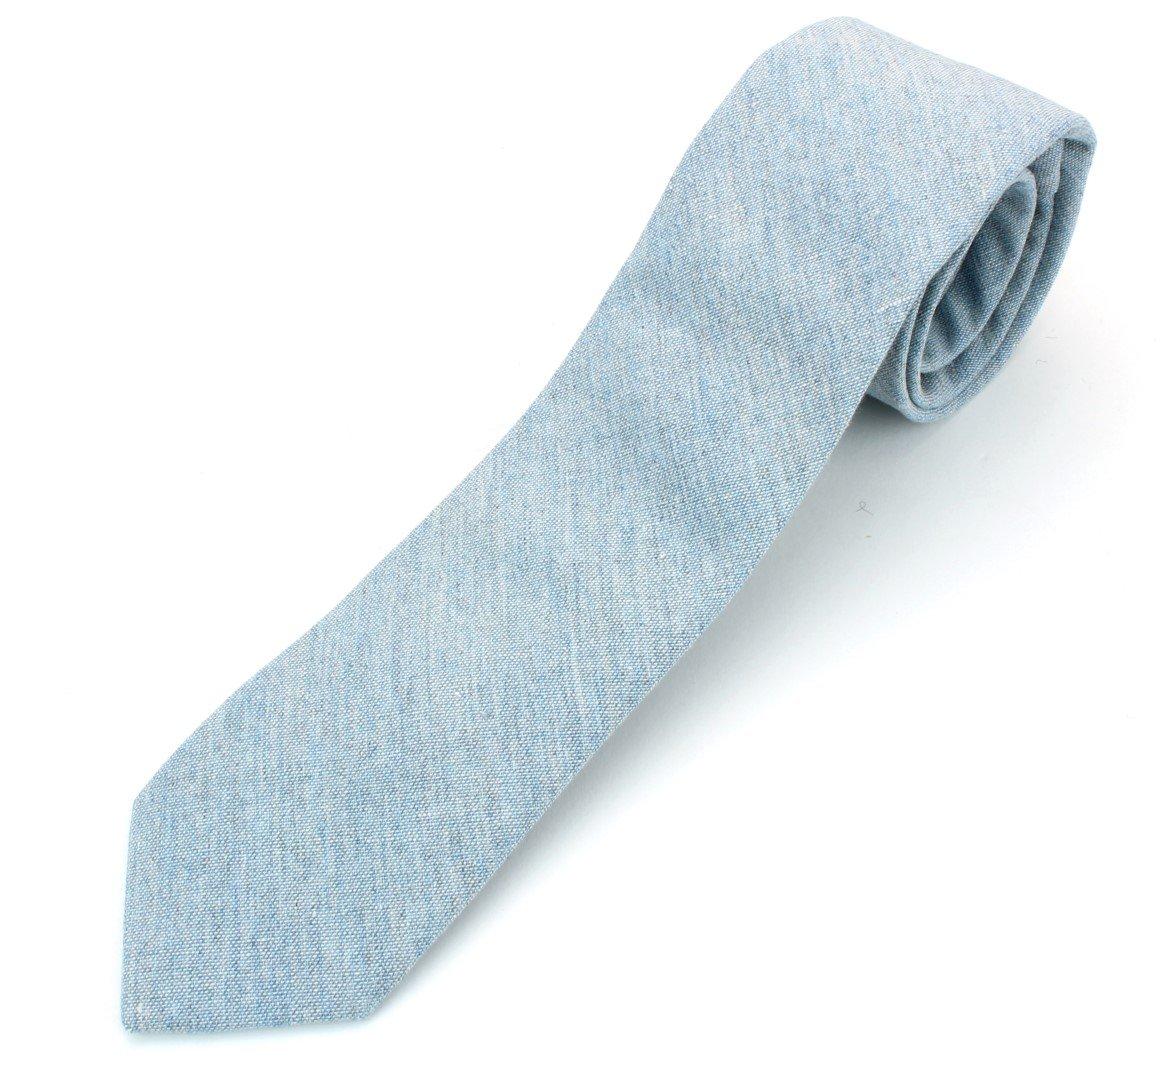 Men's Chambray Cotton Skinny Necktie Tie Textured Distressed Style - 07 - Light Blue #2